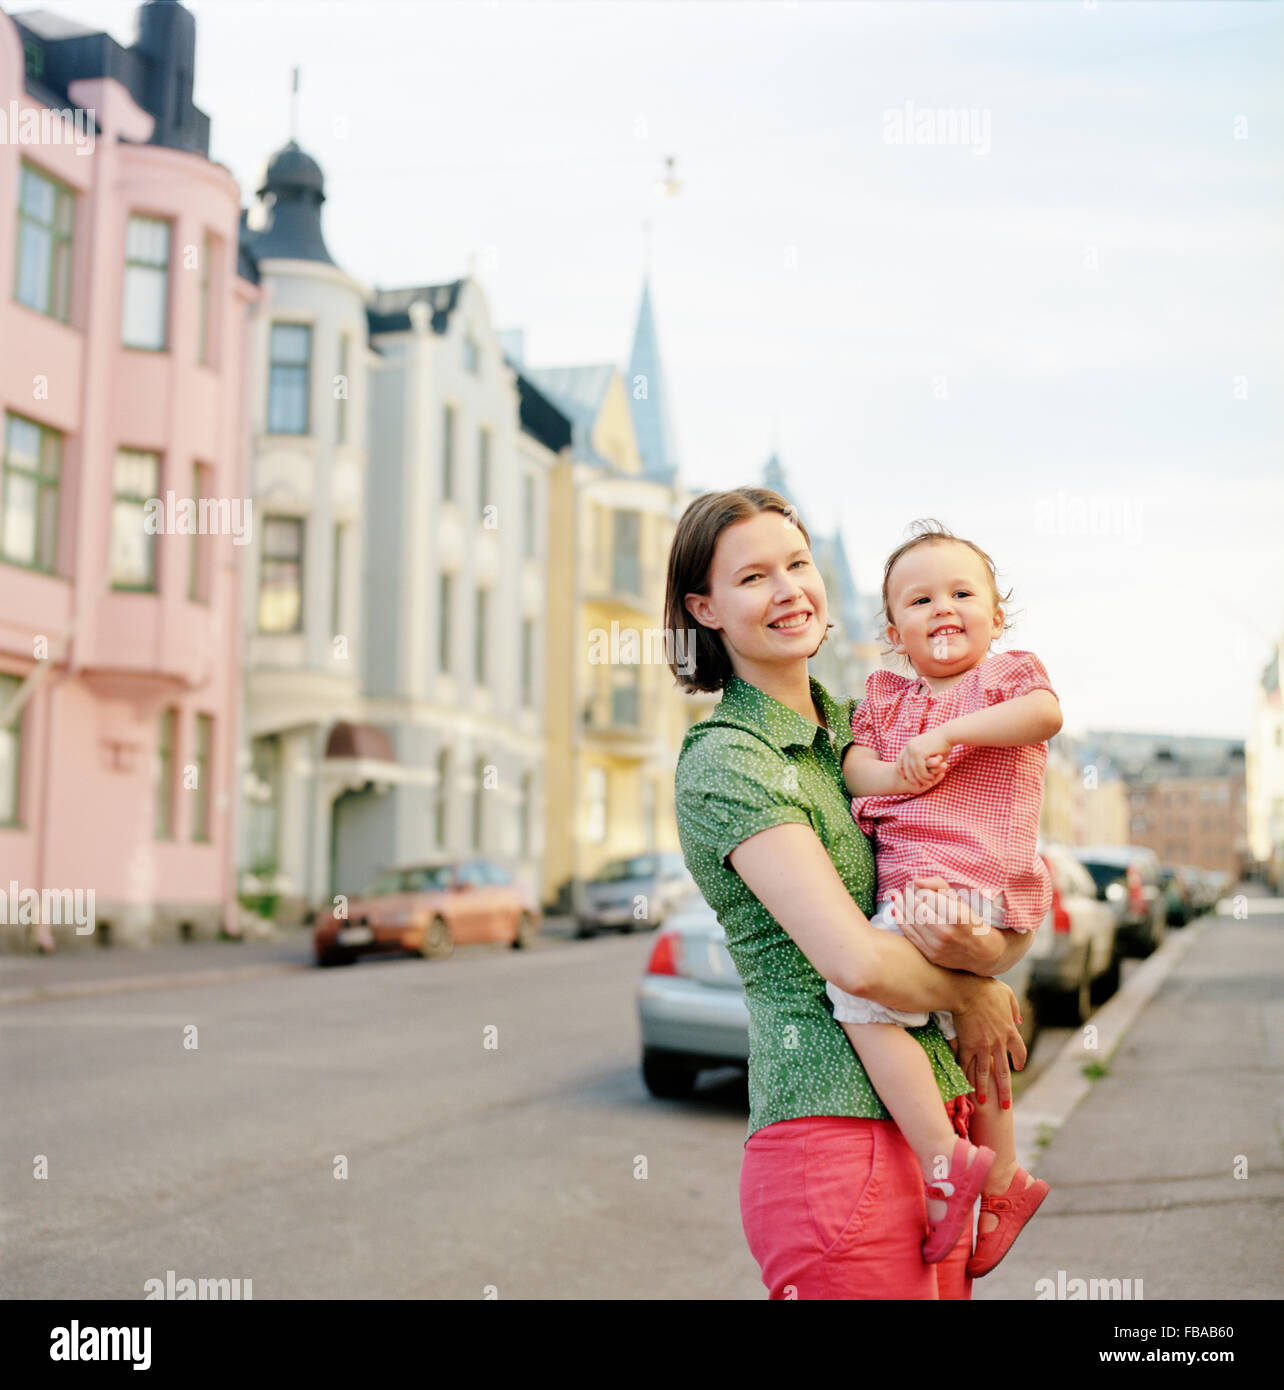 Finland, Uusimaa, Helsinki, Portrait of mother holding daughter (2-3) on street - Stock Image